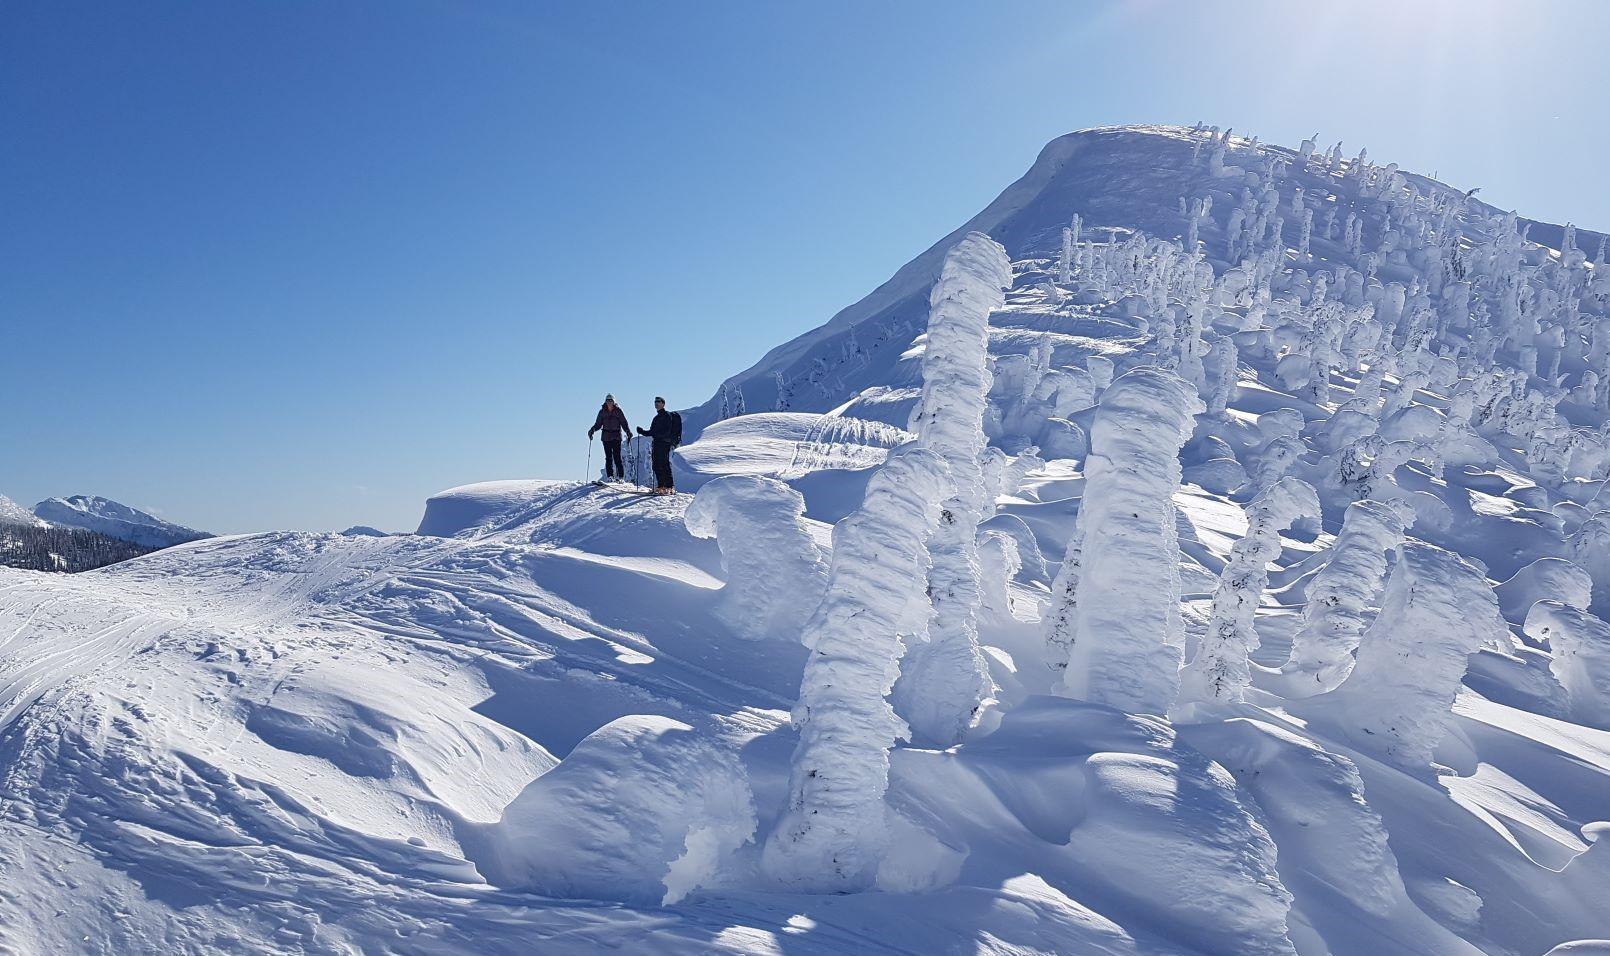 Cornice Ridge 10